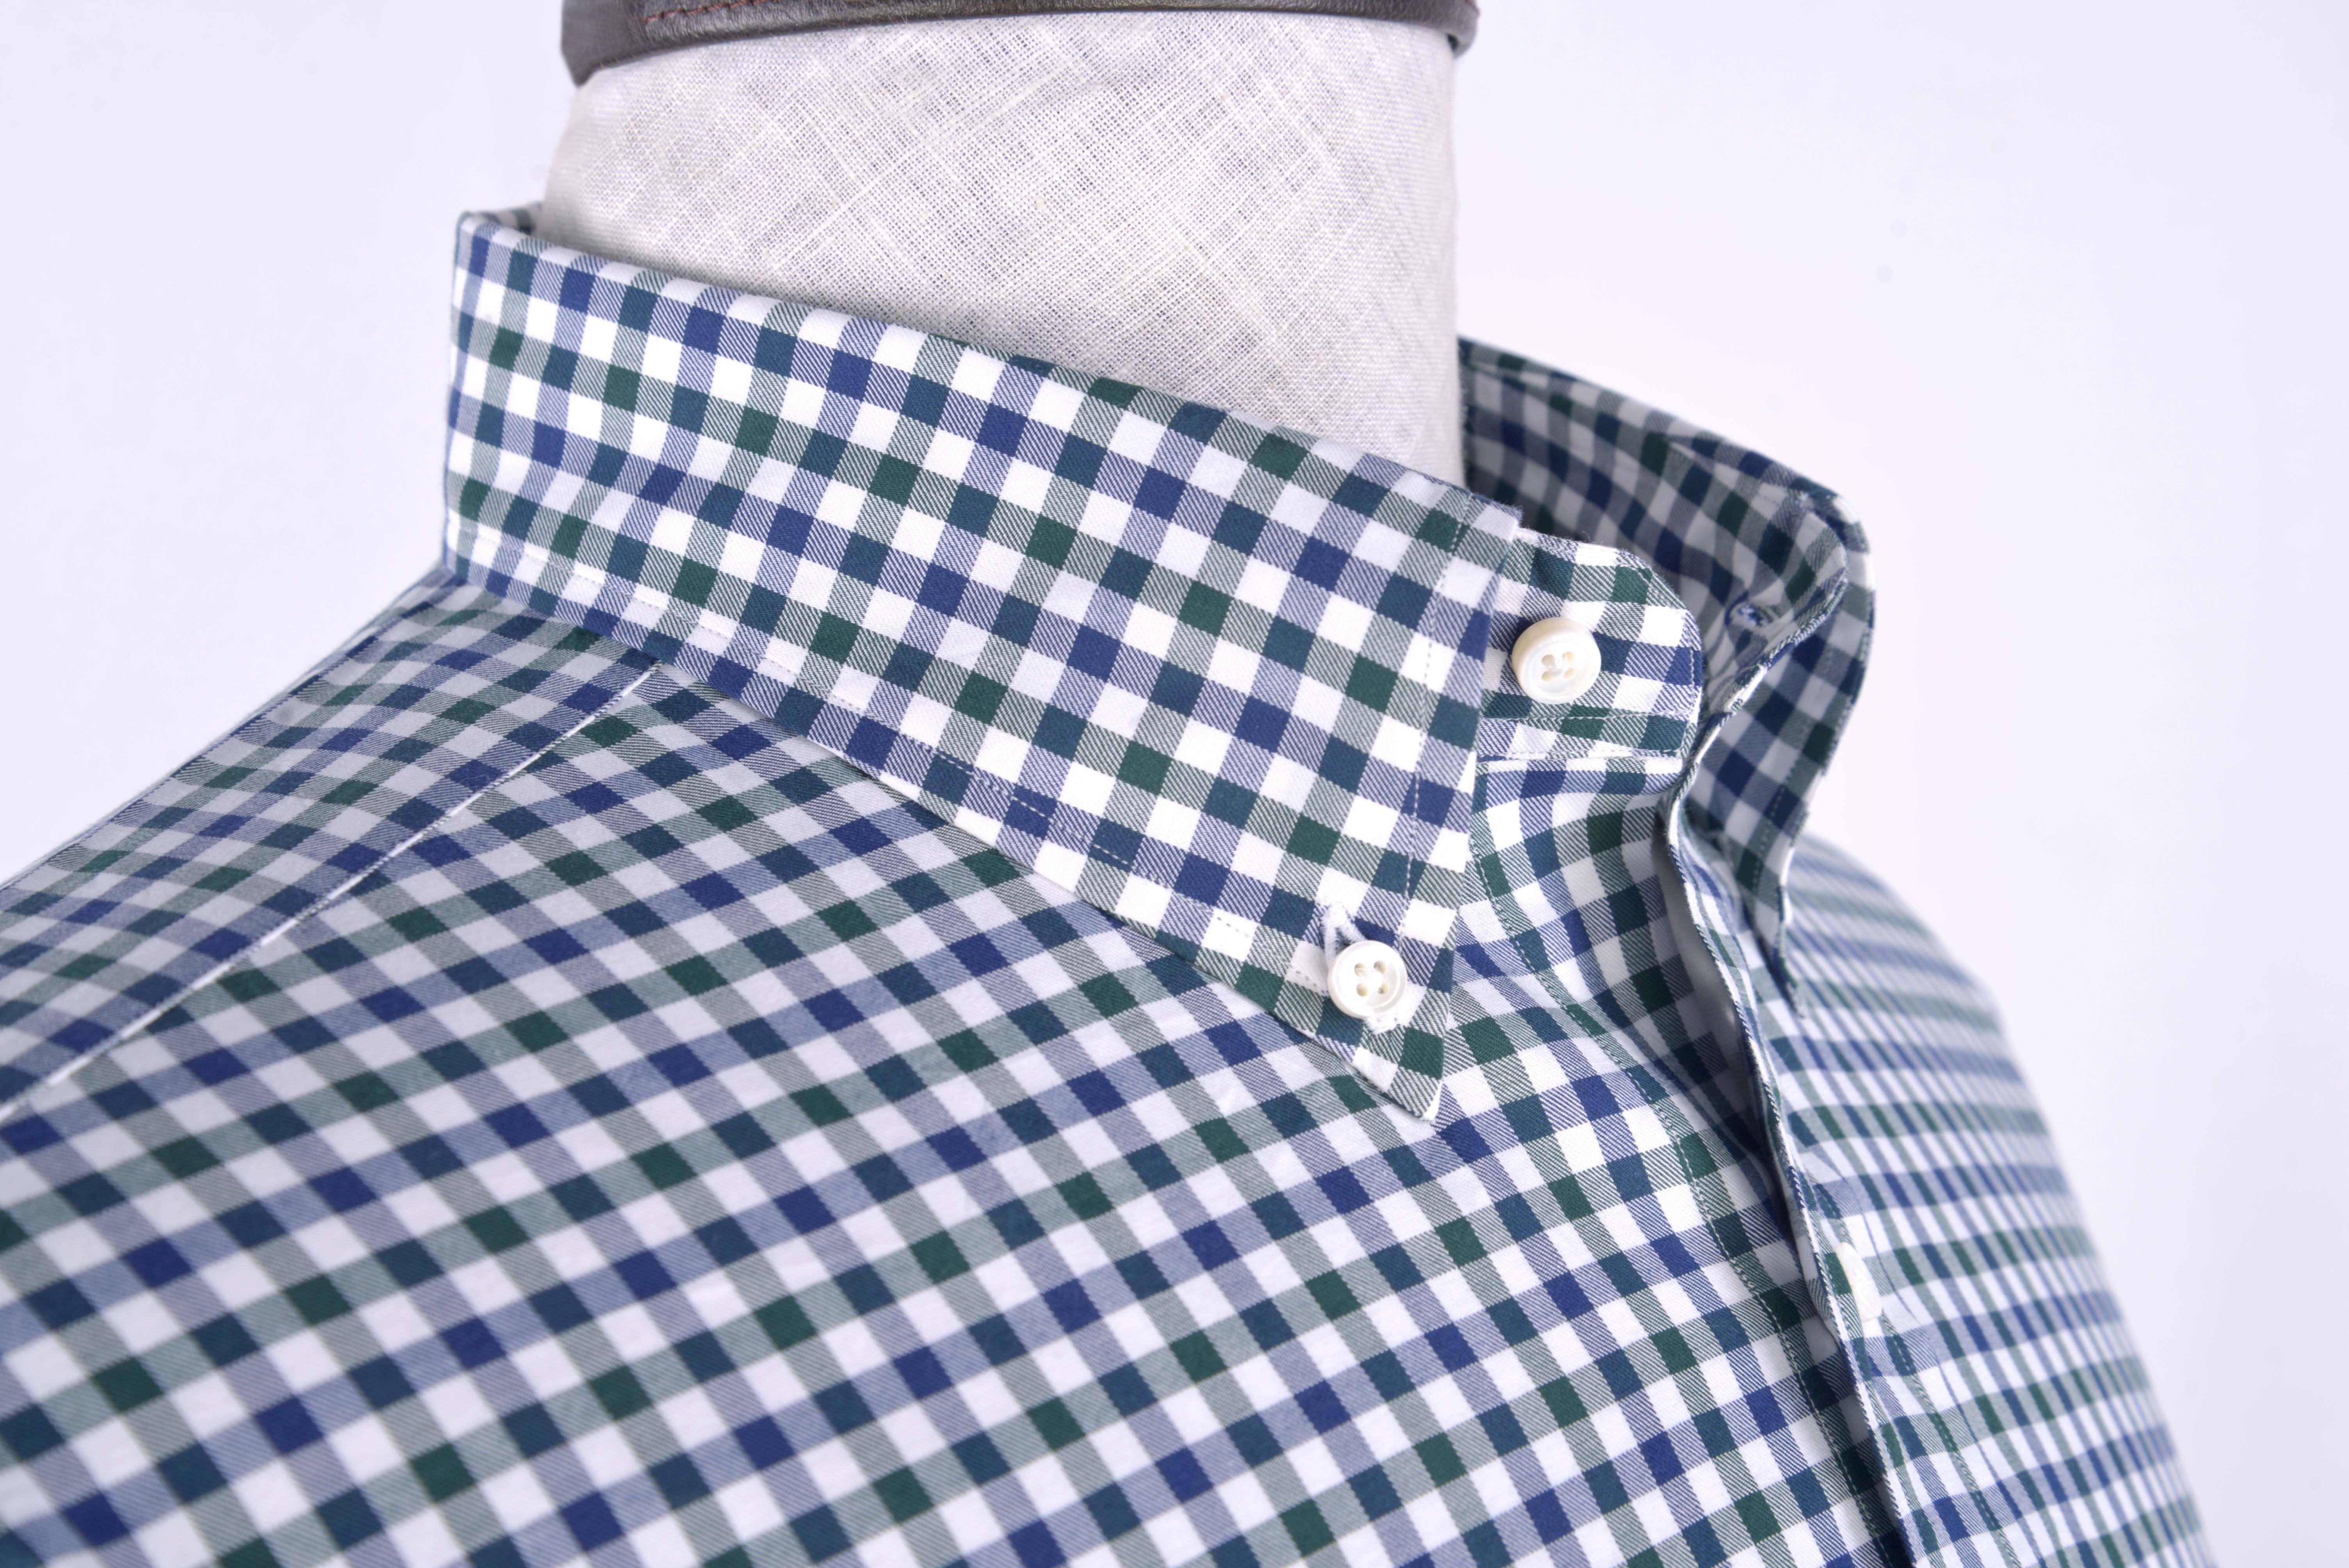 Luxire white blue green gingham  Men's shirt http://custom.luxire.com/products/white_blue_green_gingham